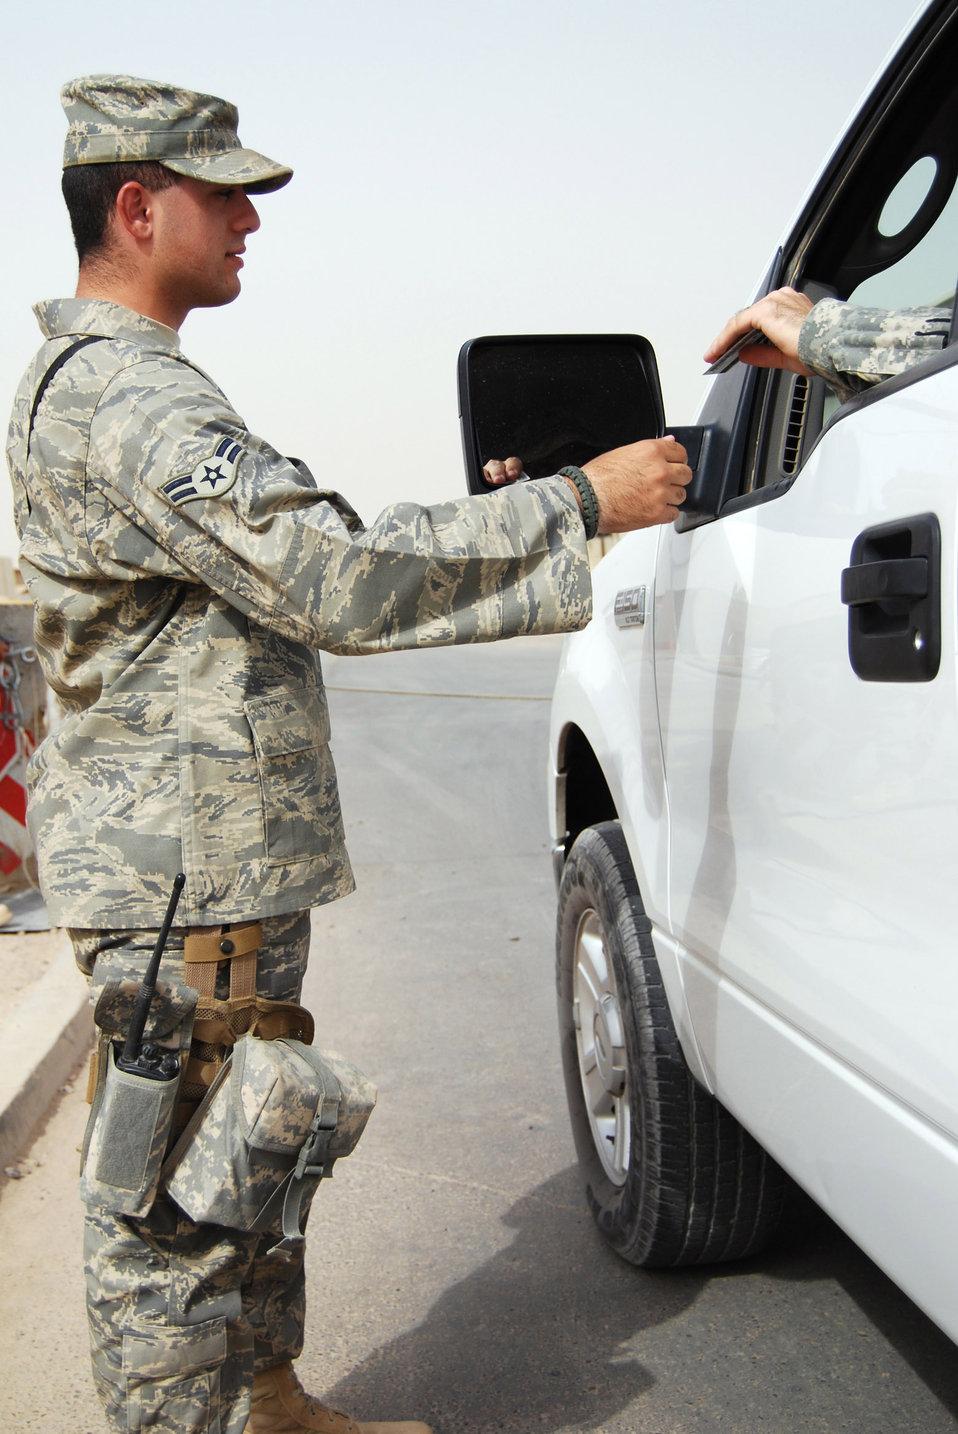 Baghdad native returns to Iraq as American Airman